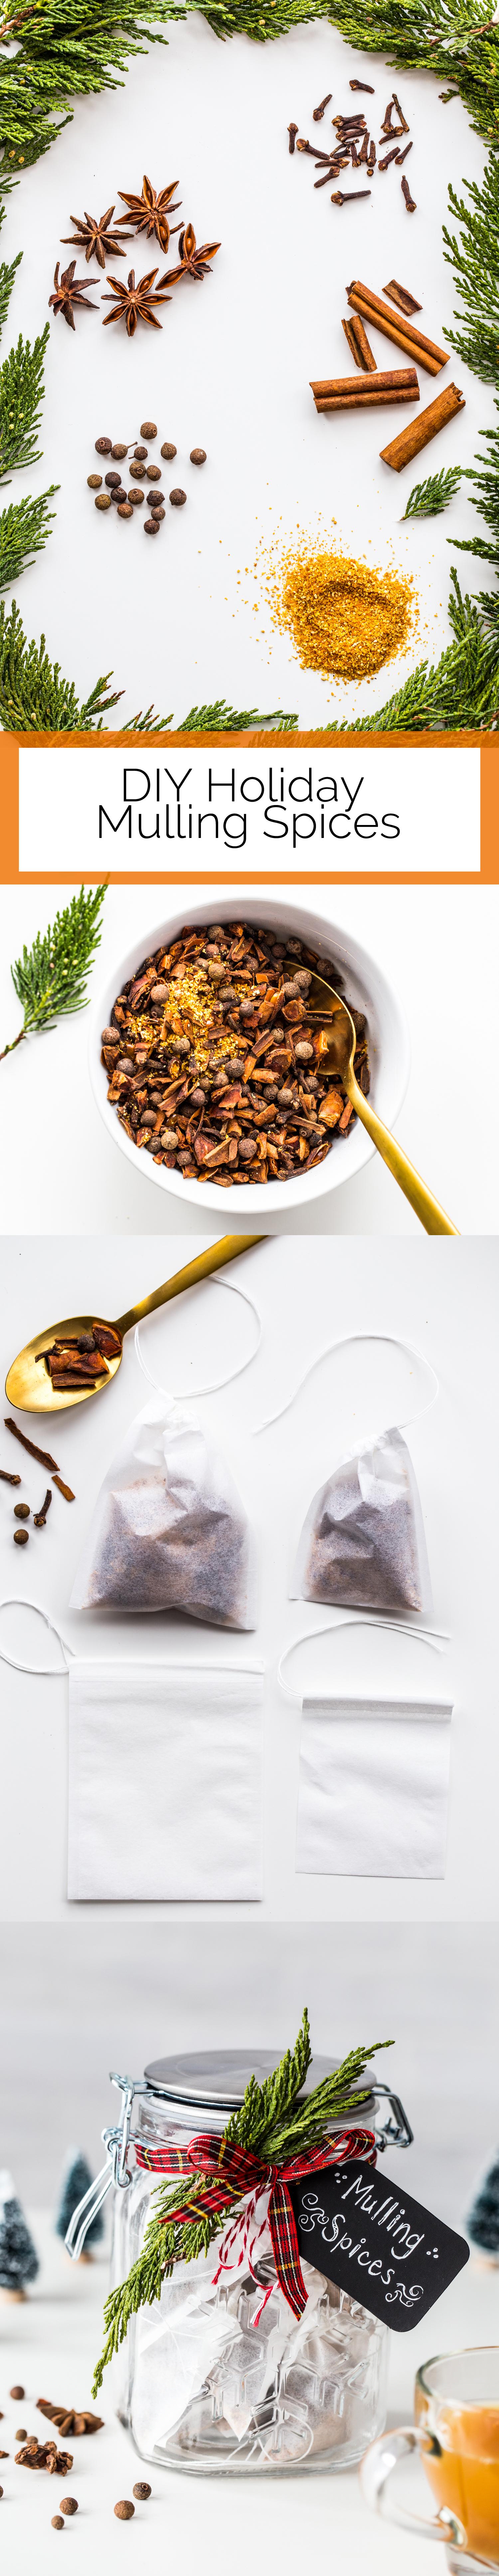 DIY Holiday Mulling Spices Long Pin